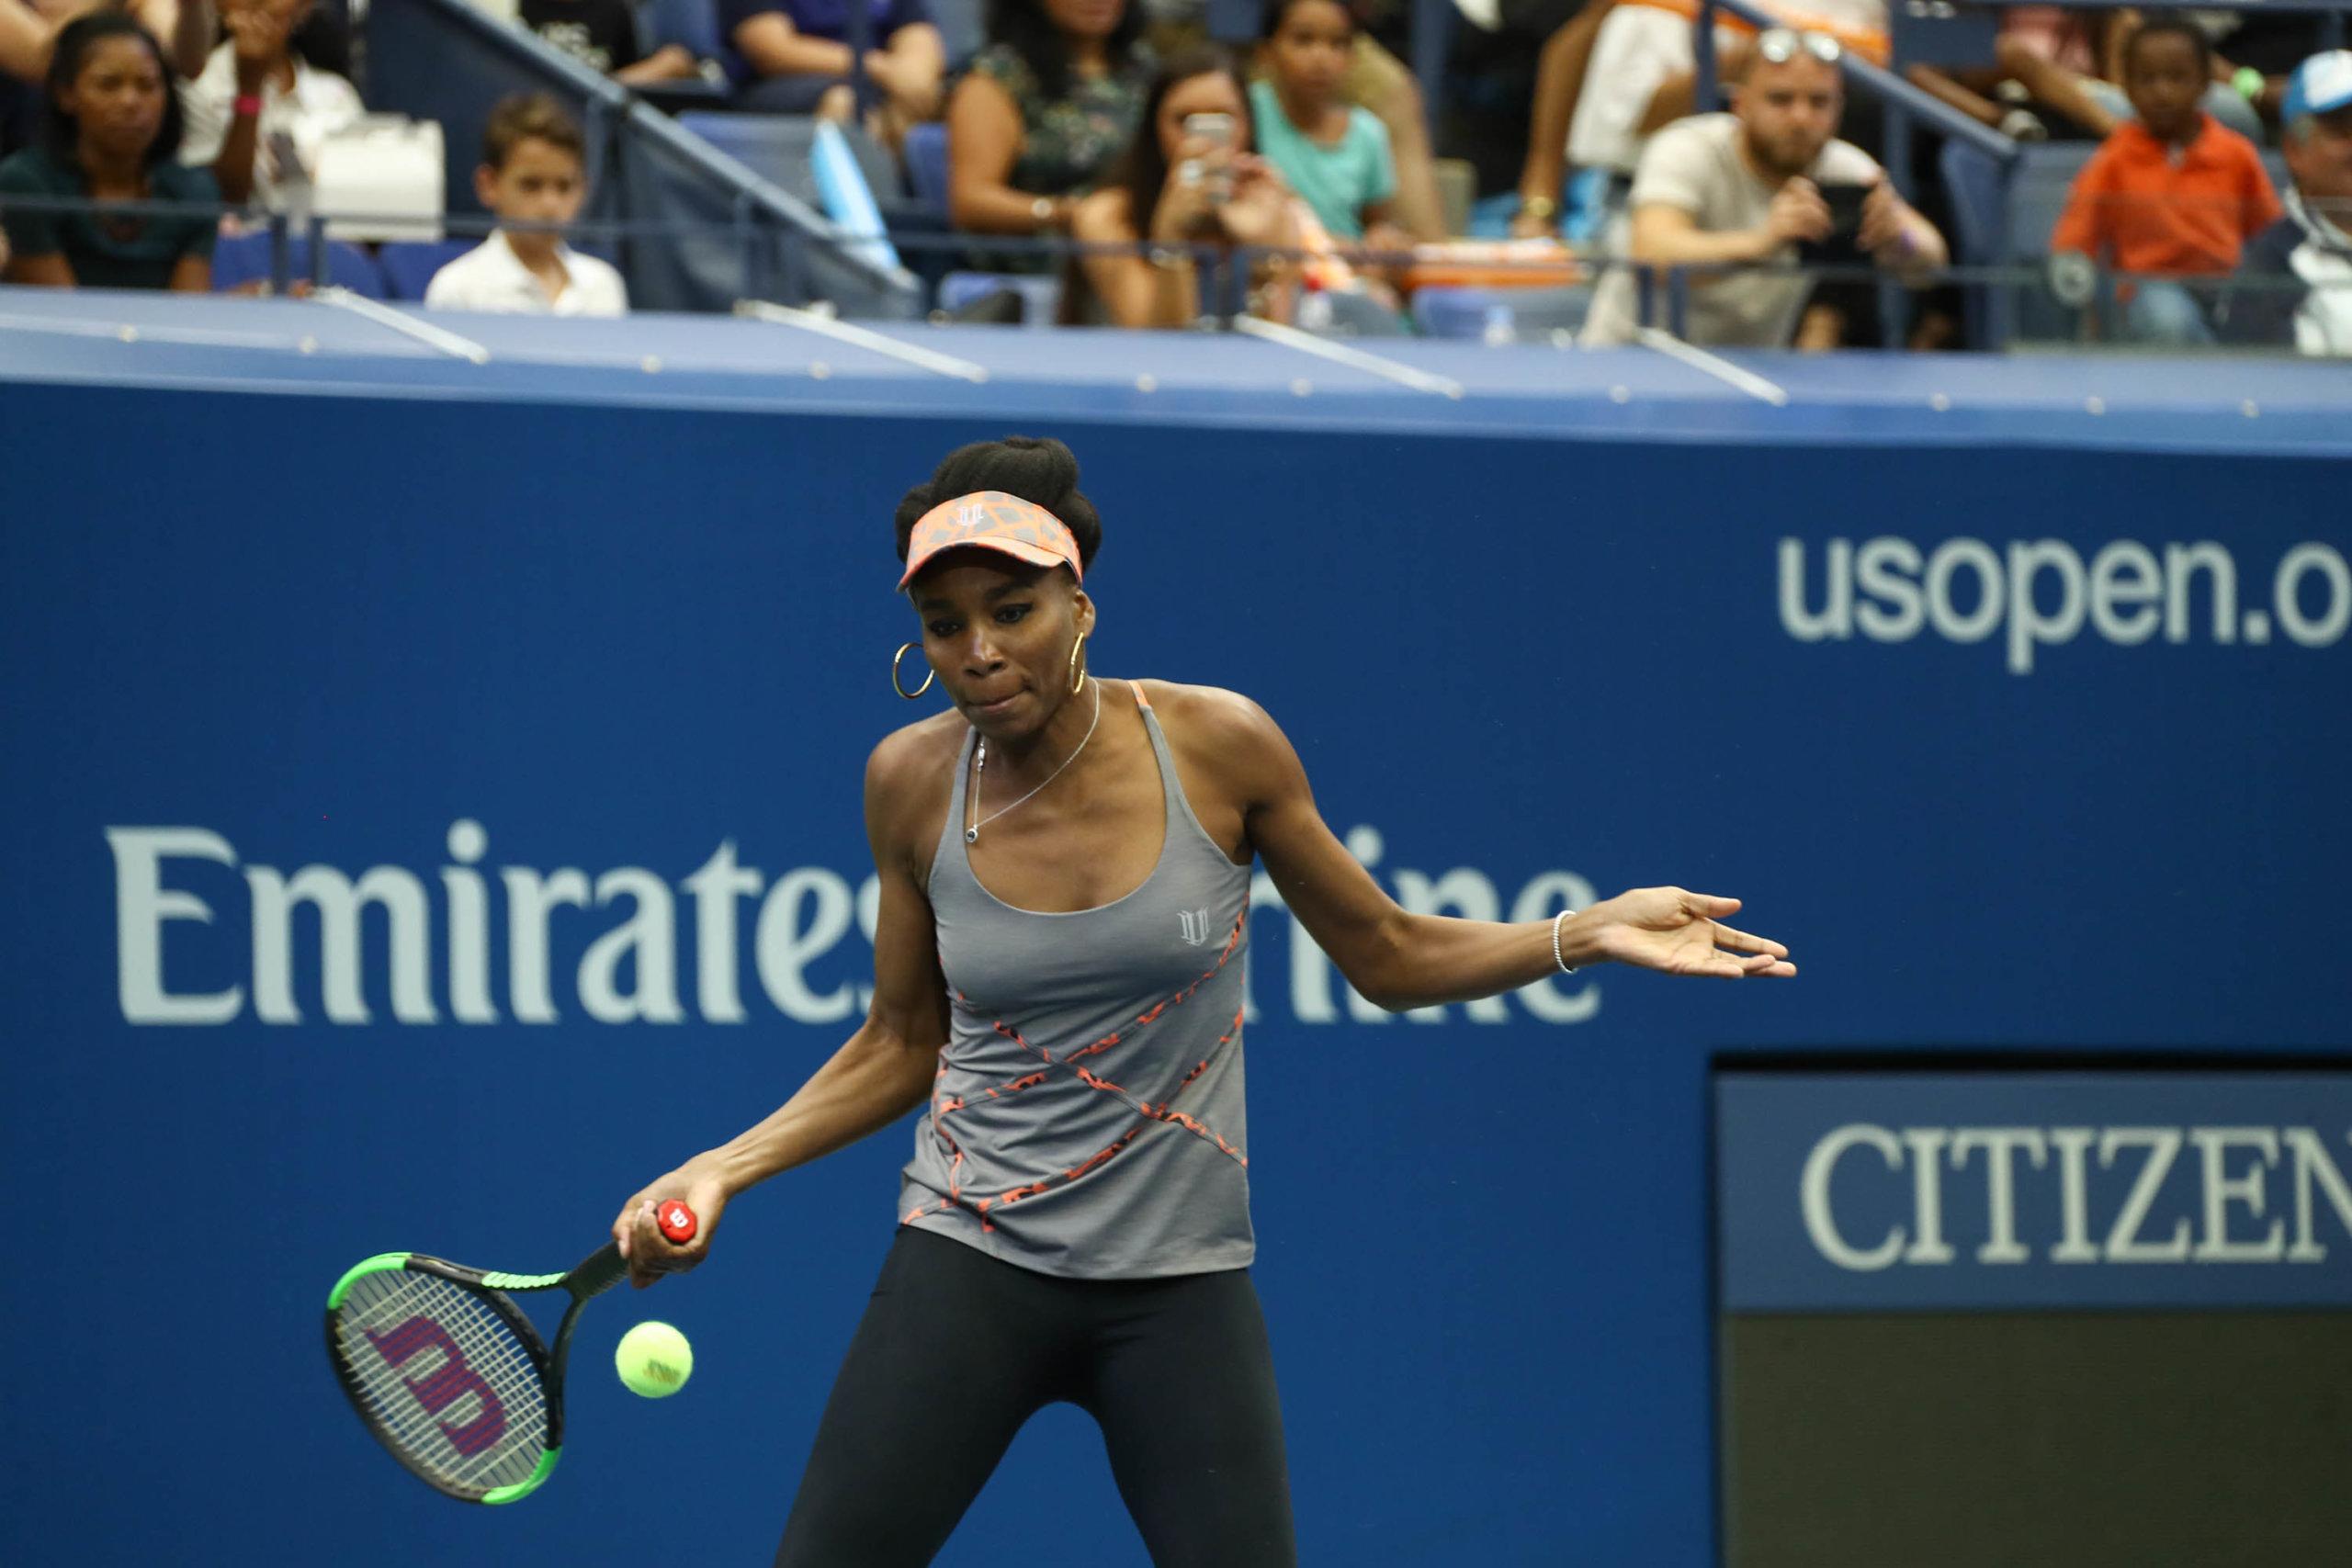 A photo of Venus Williams